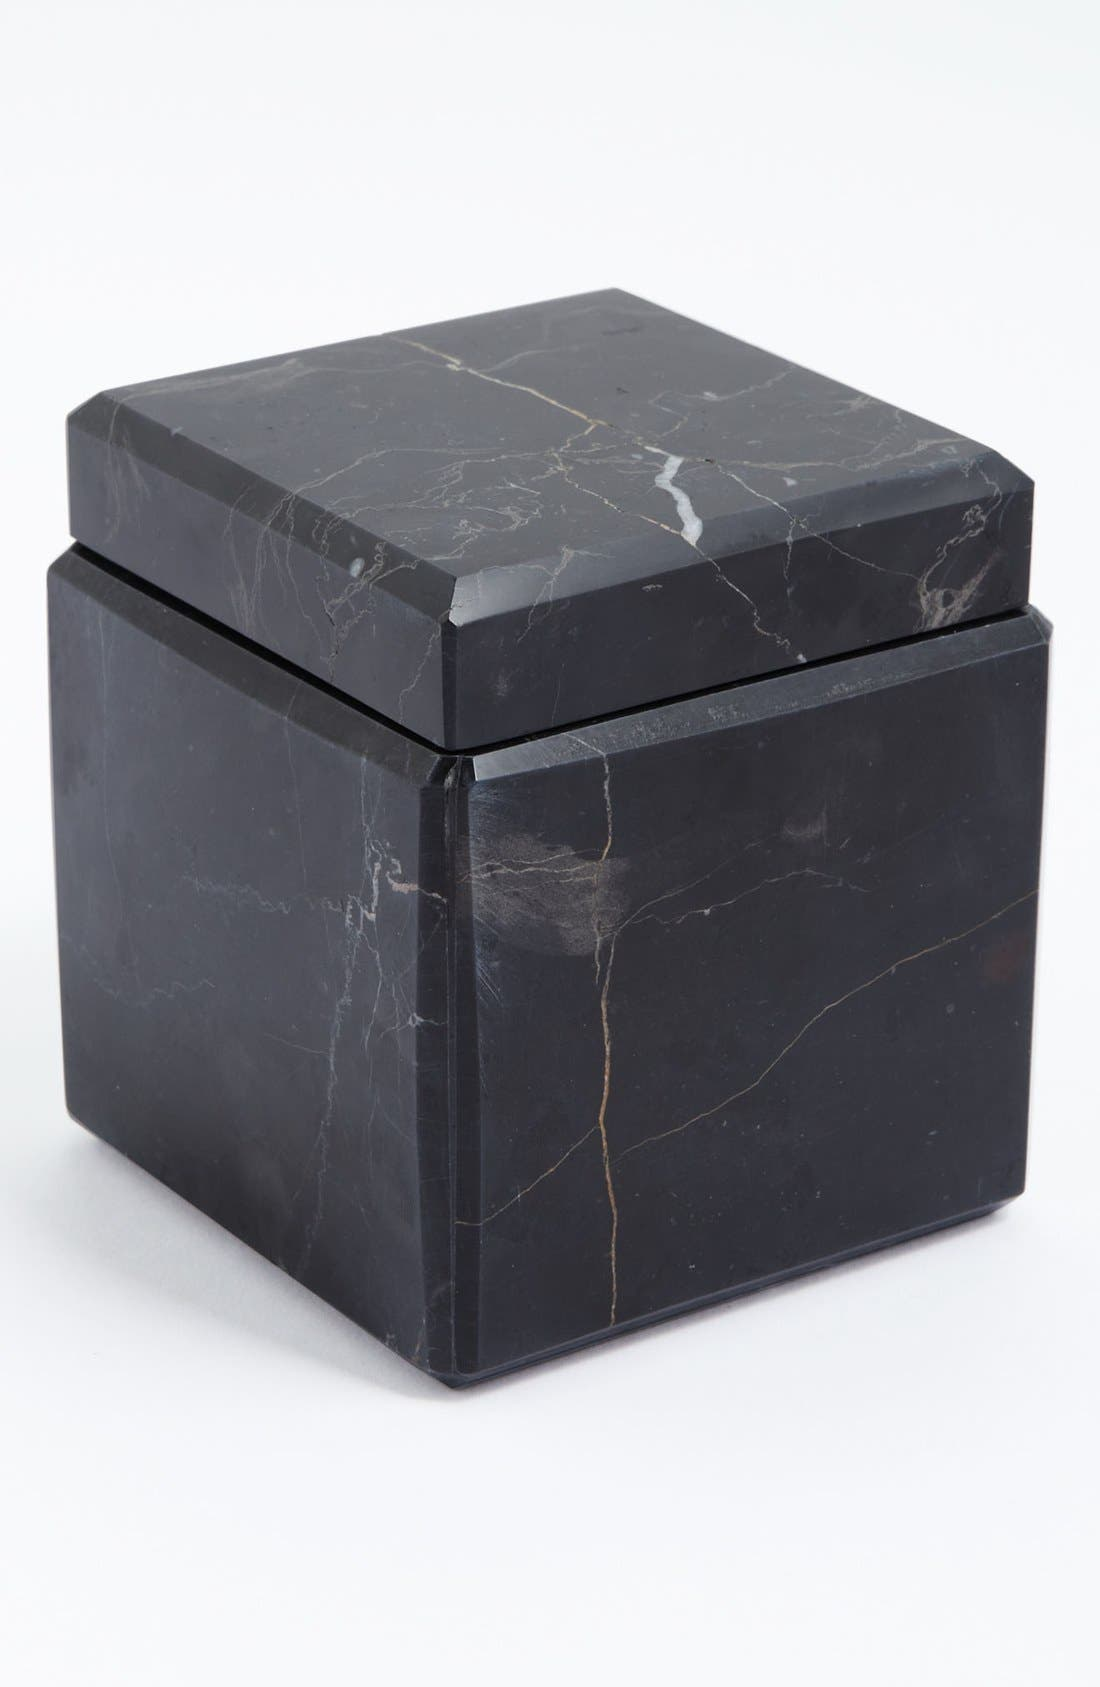 Waterworks Studio 'Luna' Black Marble Covered Jar (Online Only)